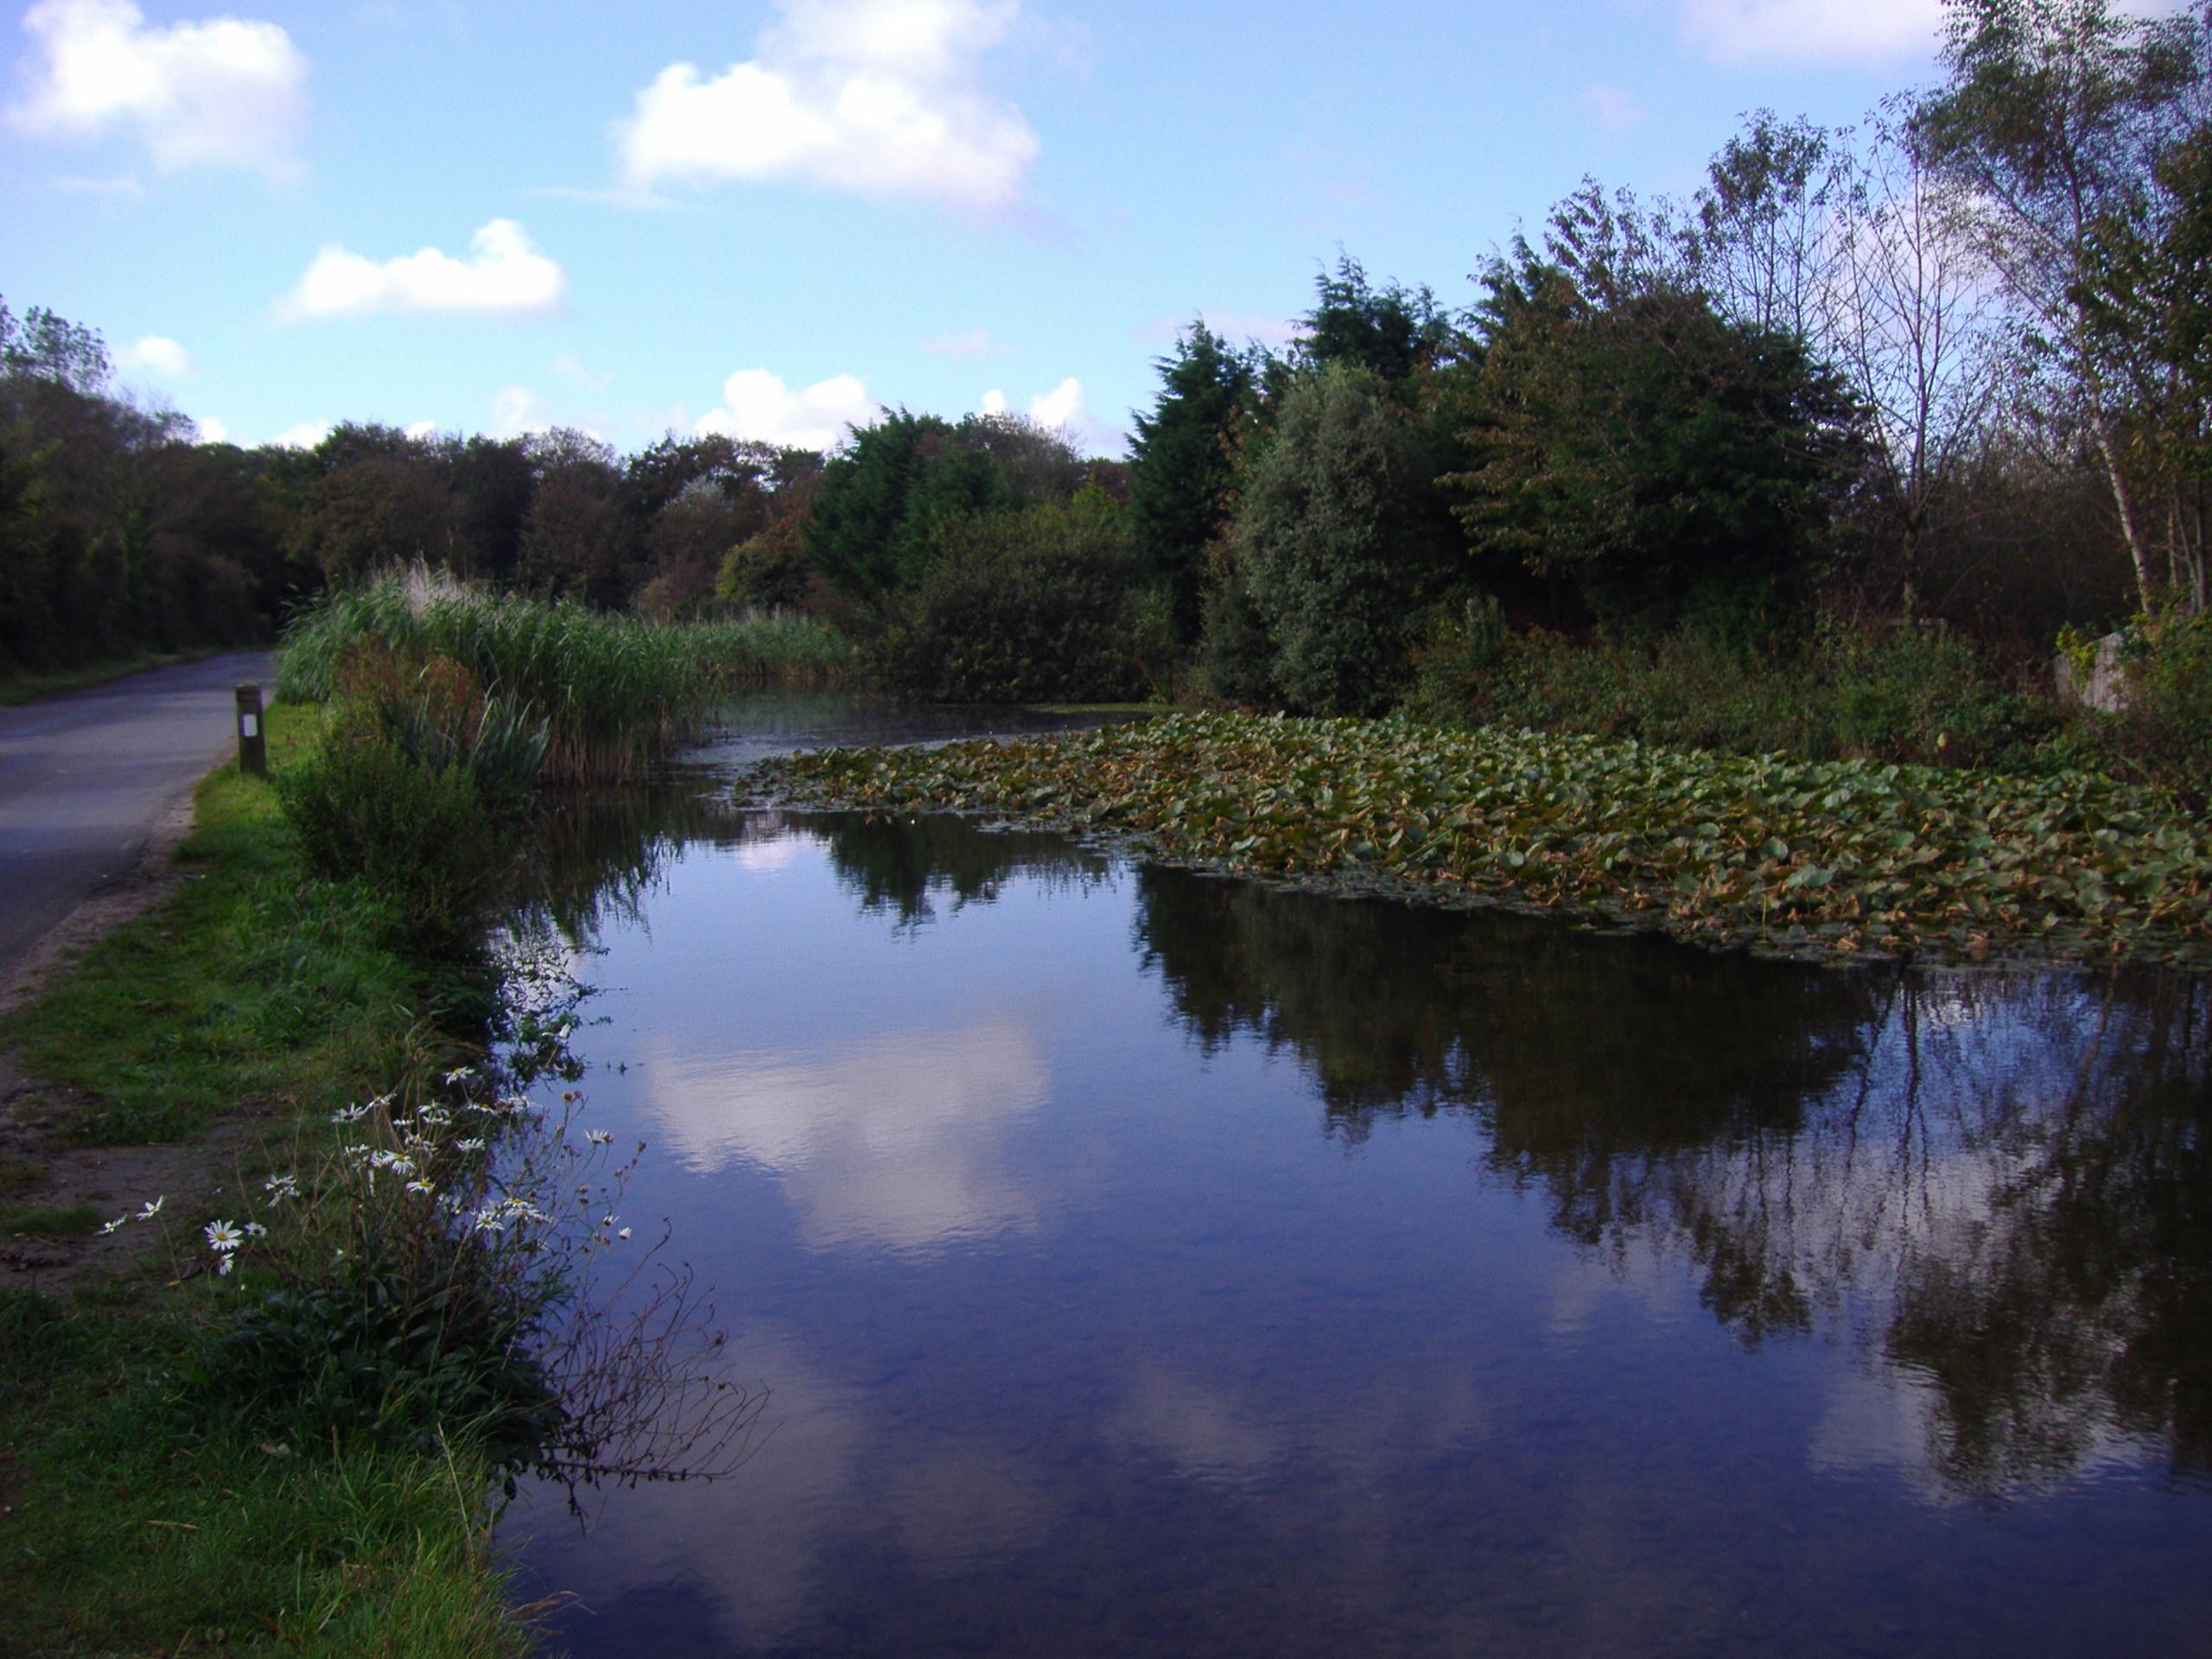 نهر بركة وروافده بالصور Gimingham_mill_pond_River_Mun